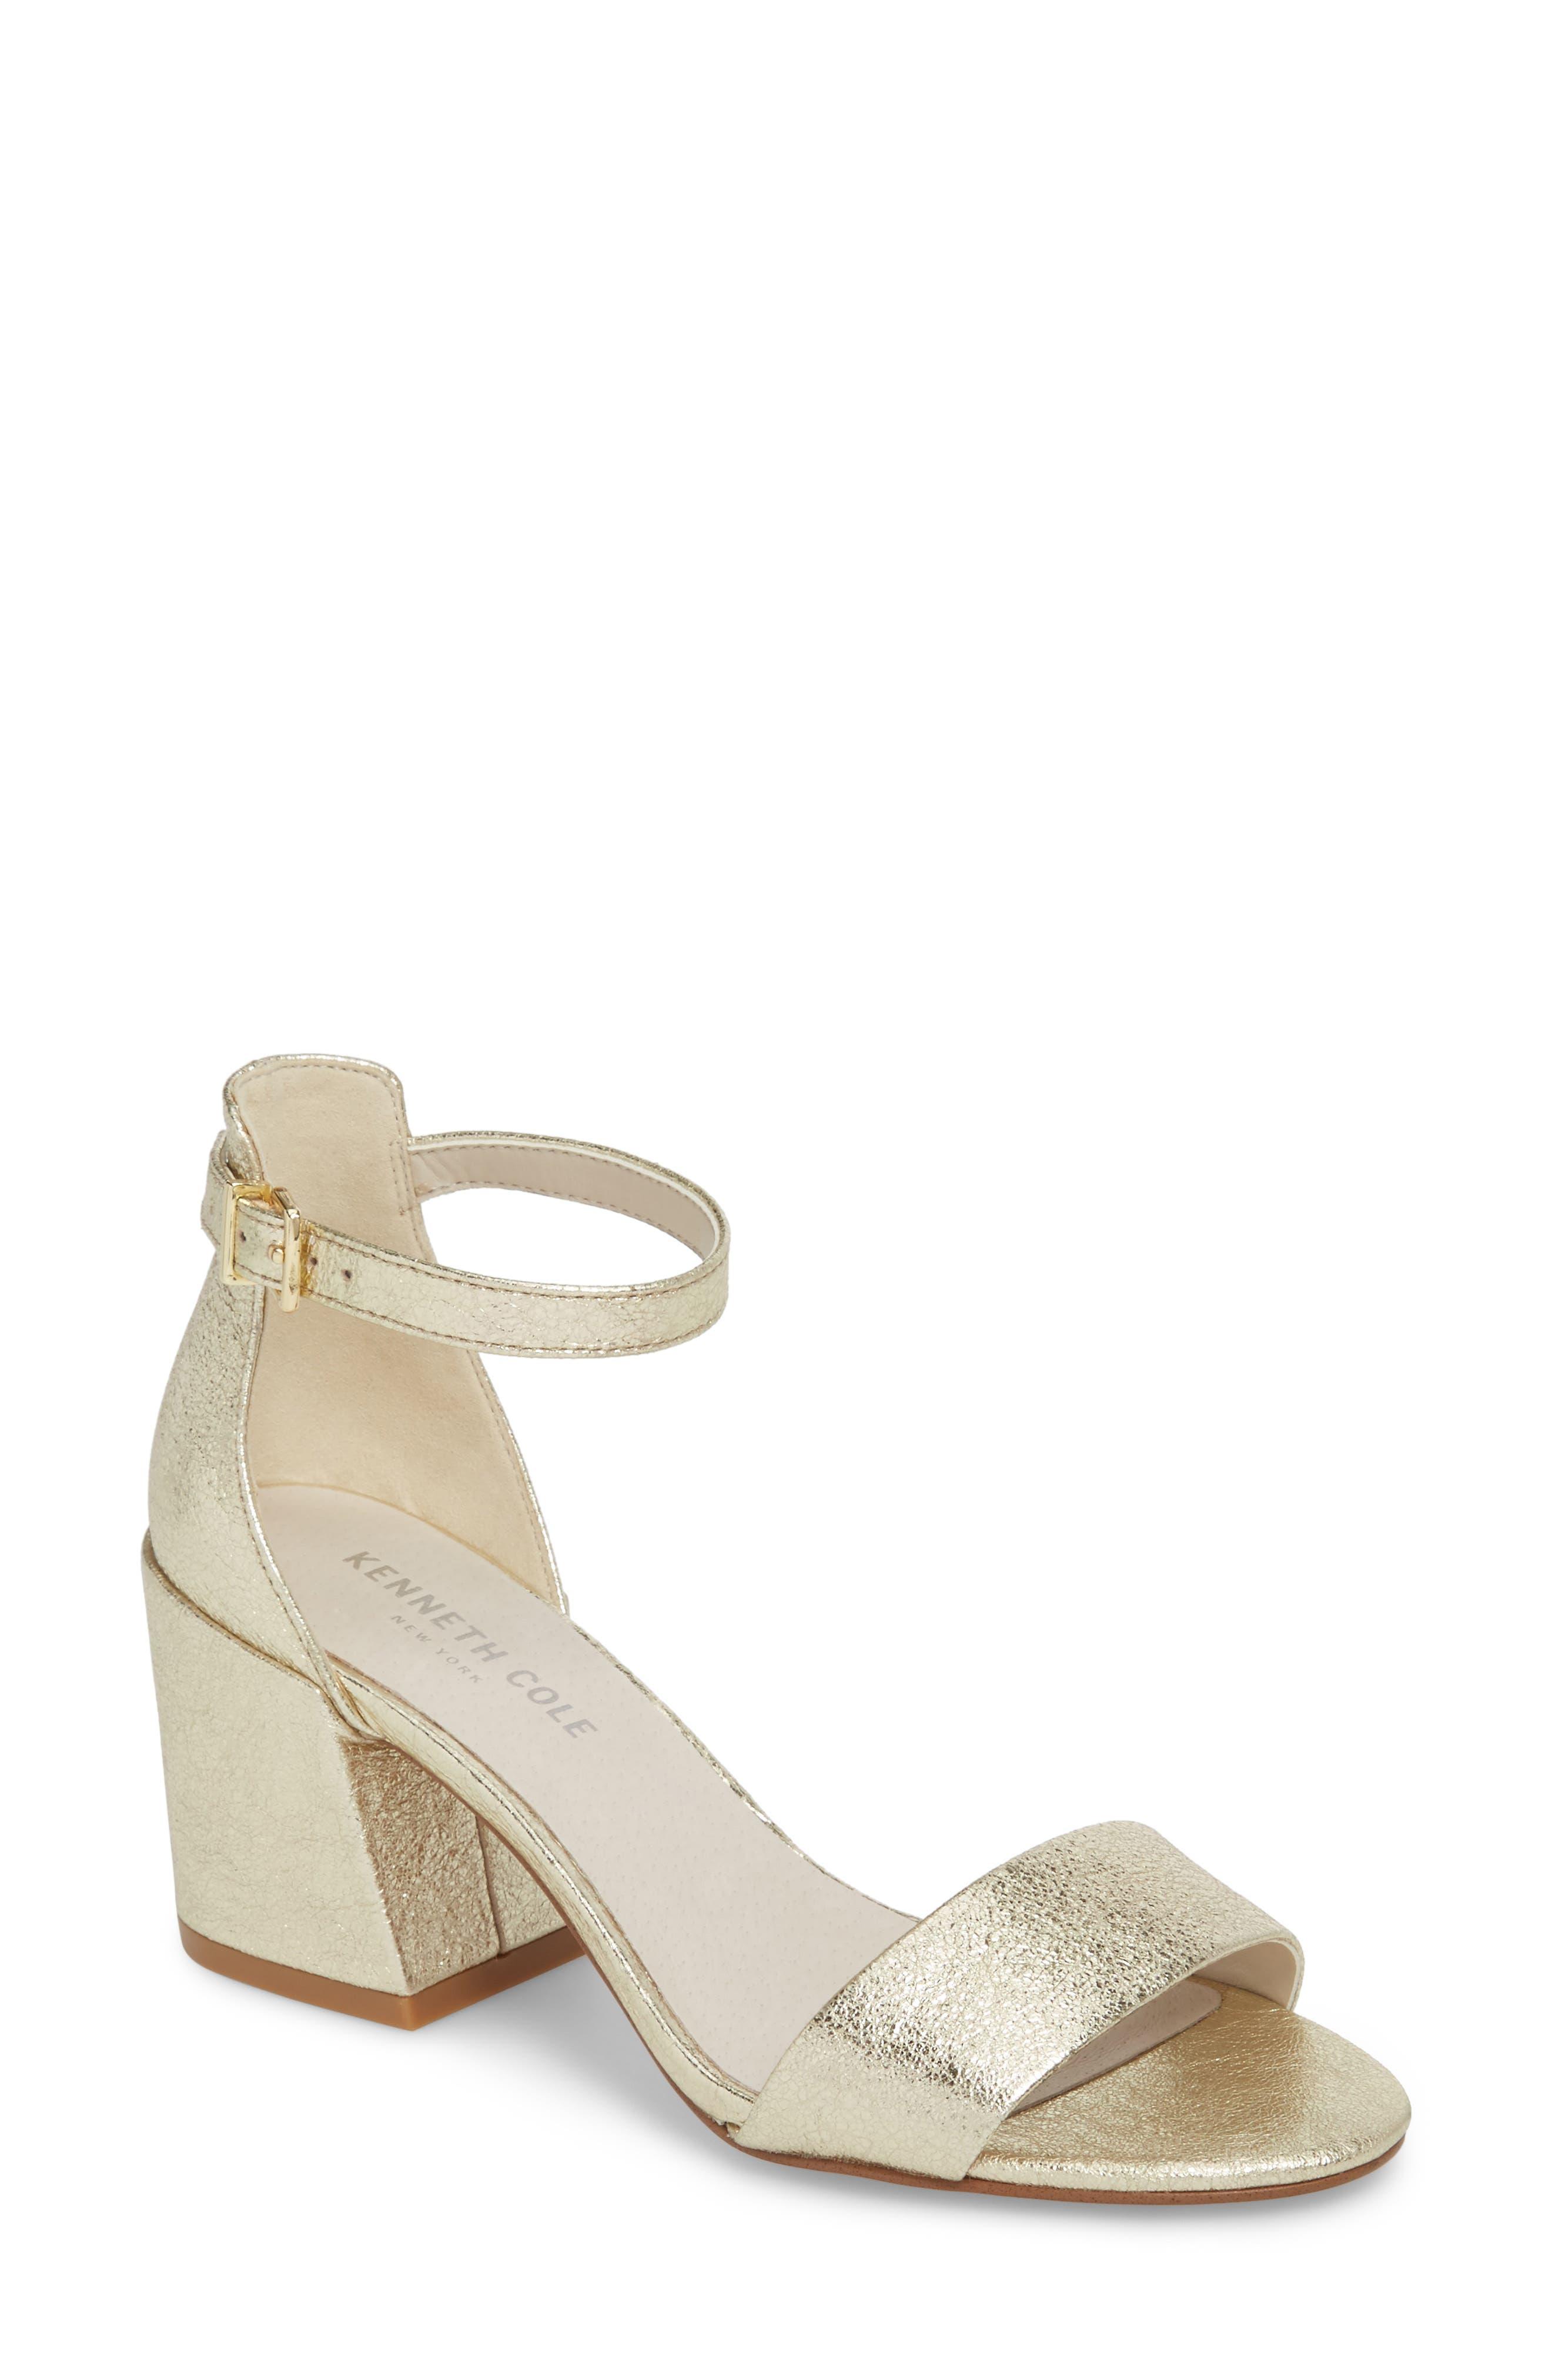 Kenneth Cole New York Hannon Block Heel Ankle Strap Sandal Women